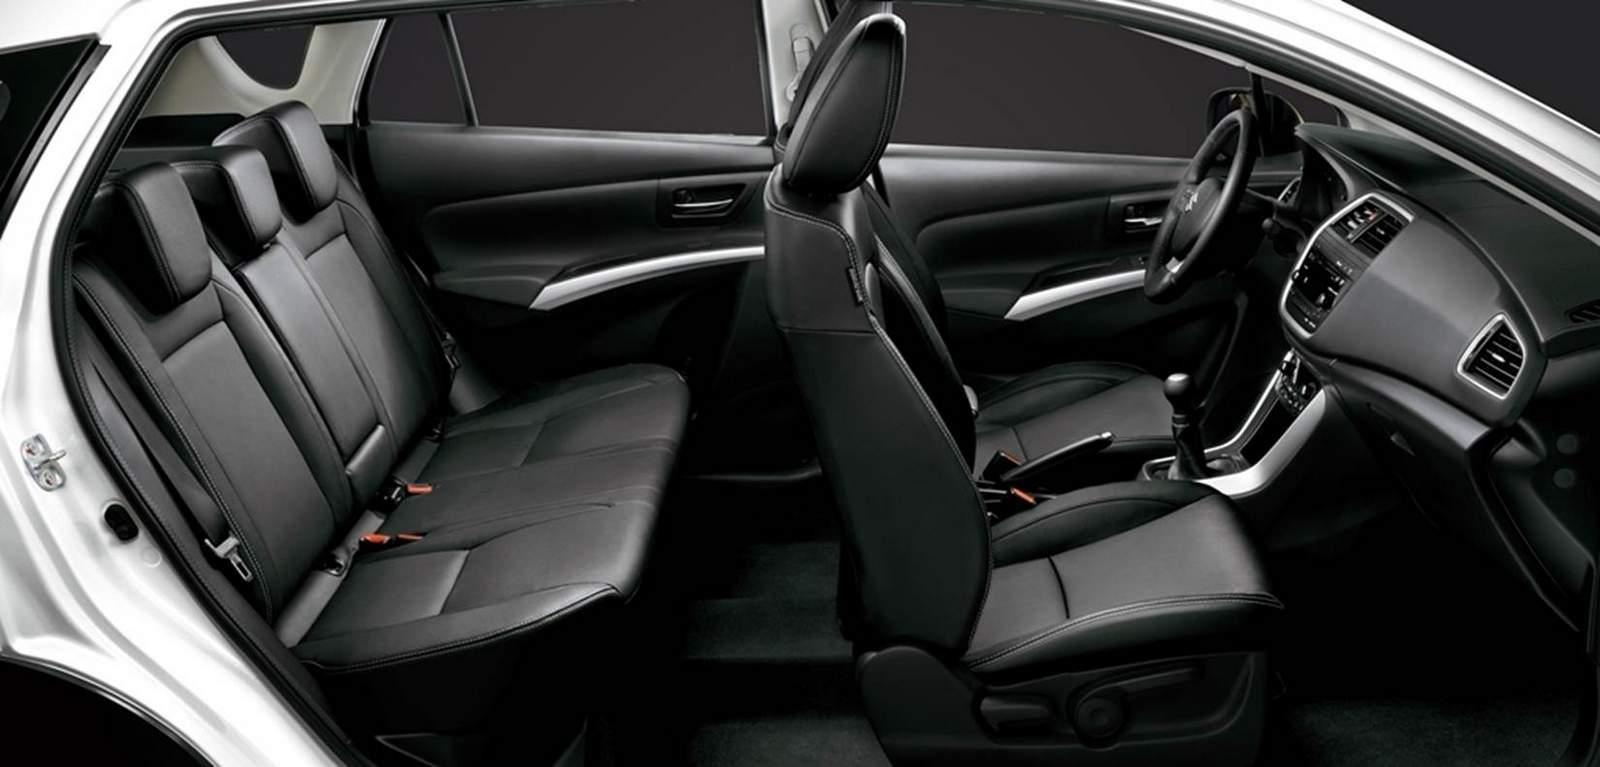 Suzuki S-Cross 2015 Brasil - interior